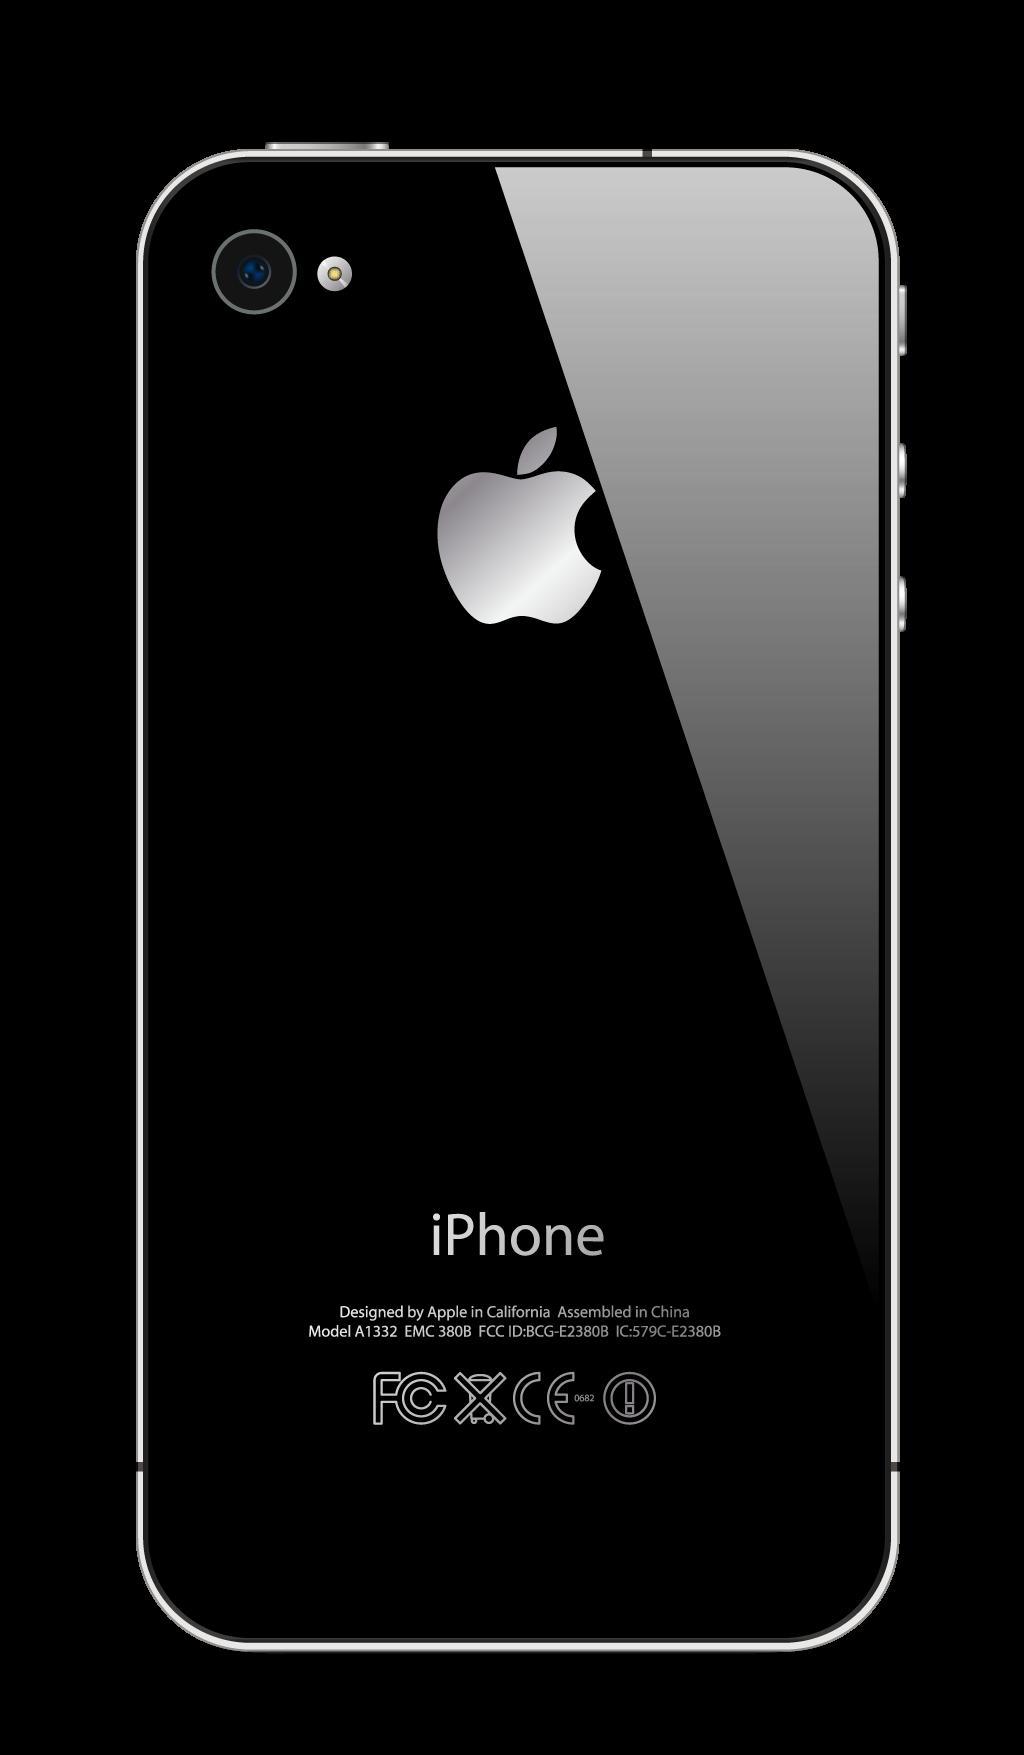 Iphone Apple Png Image Iphone Iphone Logo Smartphone Wallpaper